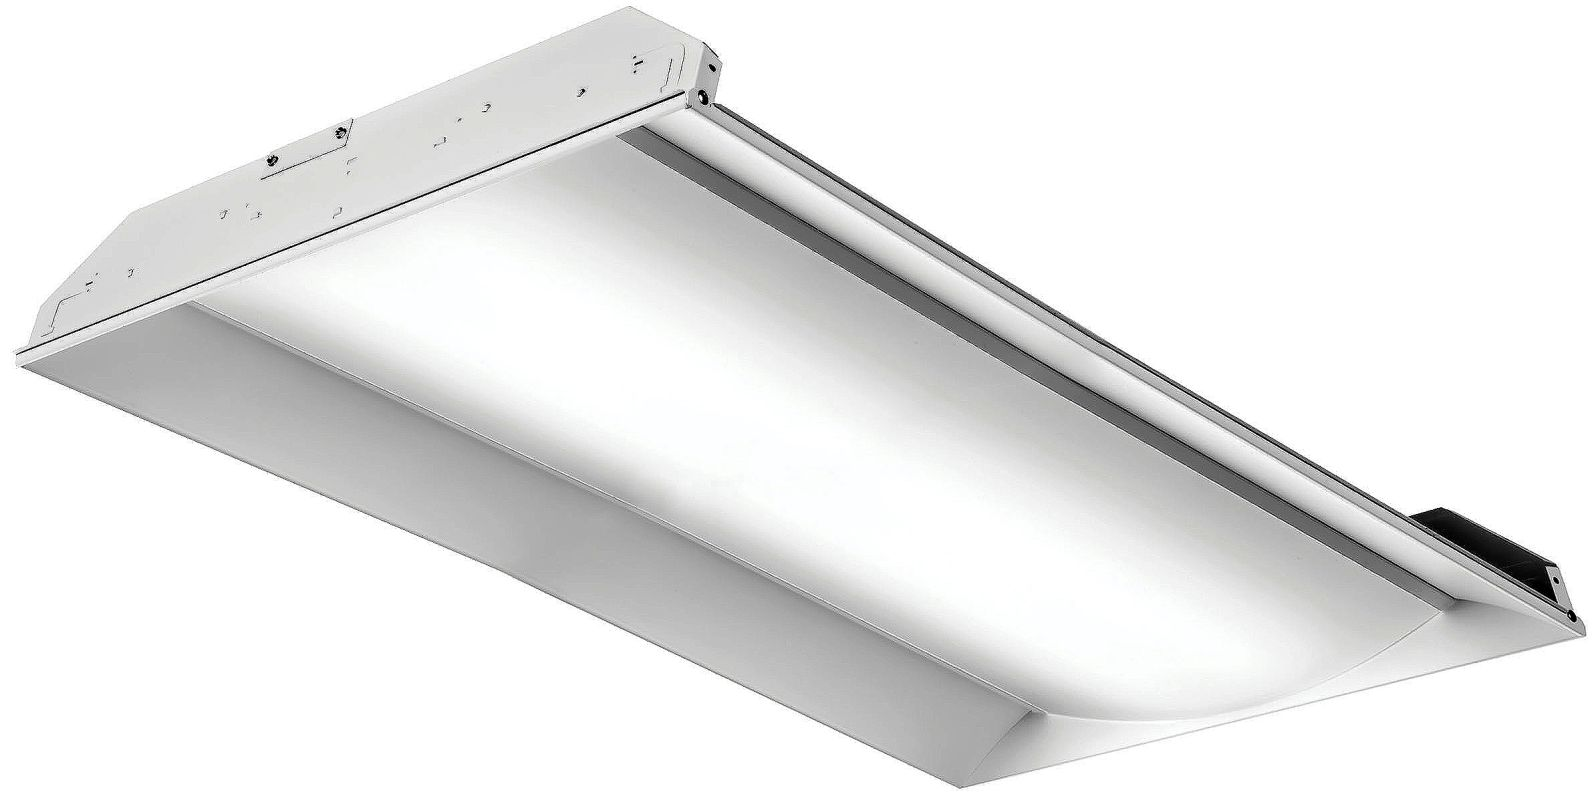 lithonia lighting 2fsl4 40l ez1 lp840 white 1 light 48 led ic rated. Black Bedroom Furniture Sets. Home Design Ideas